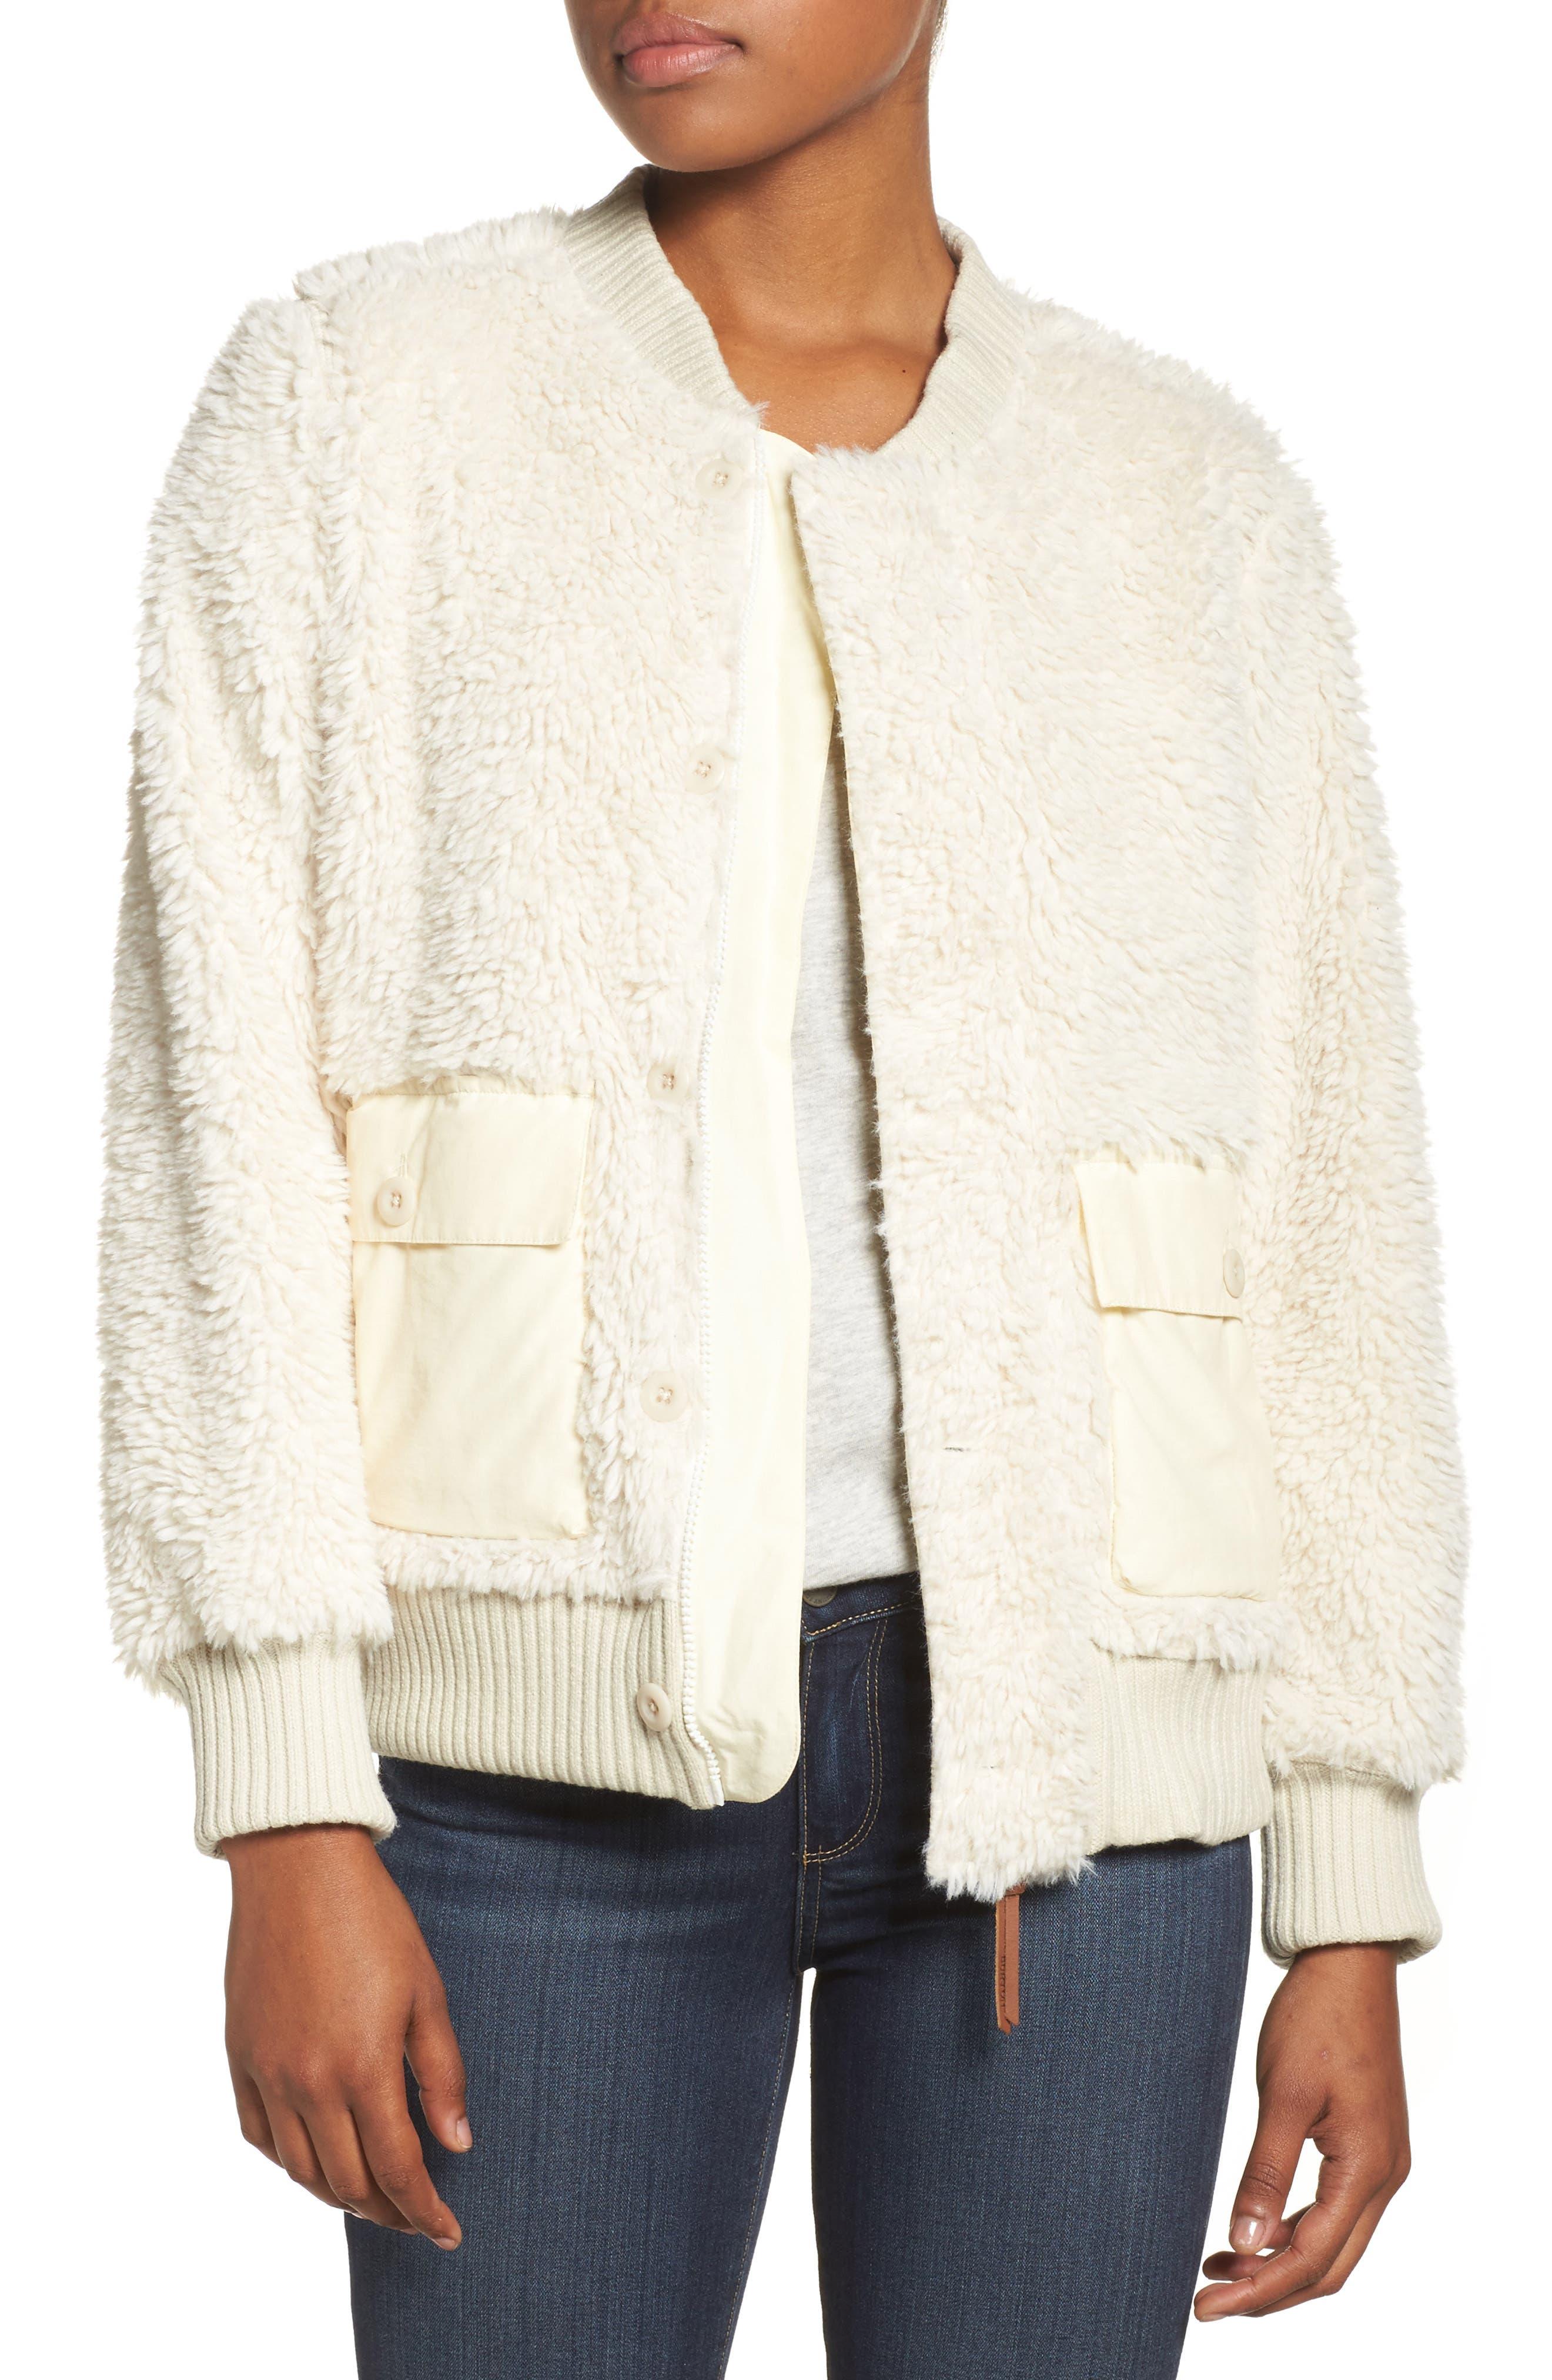 Shawmut High Pile DRYRIDE Thermex Fleece Jacket,                             Main thumbnail 1, color,                             100